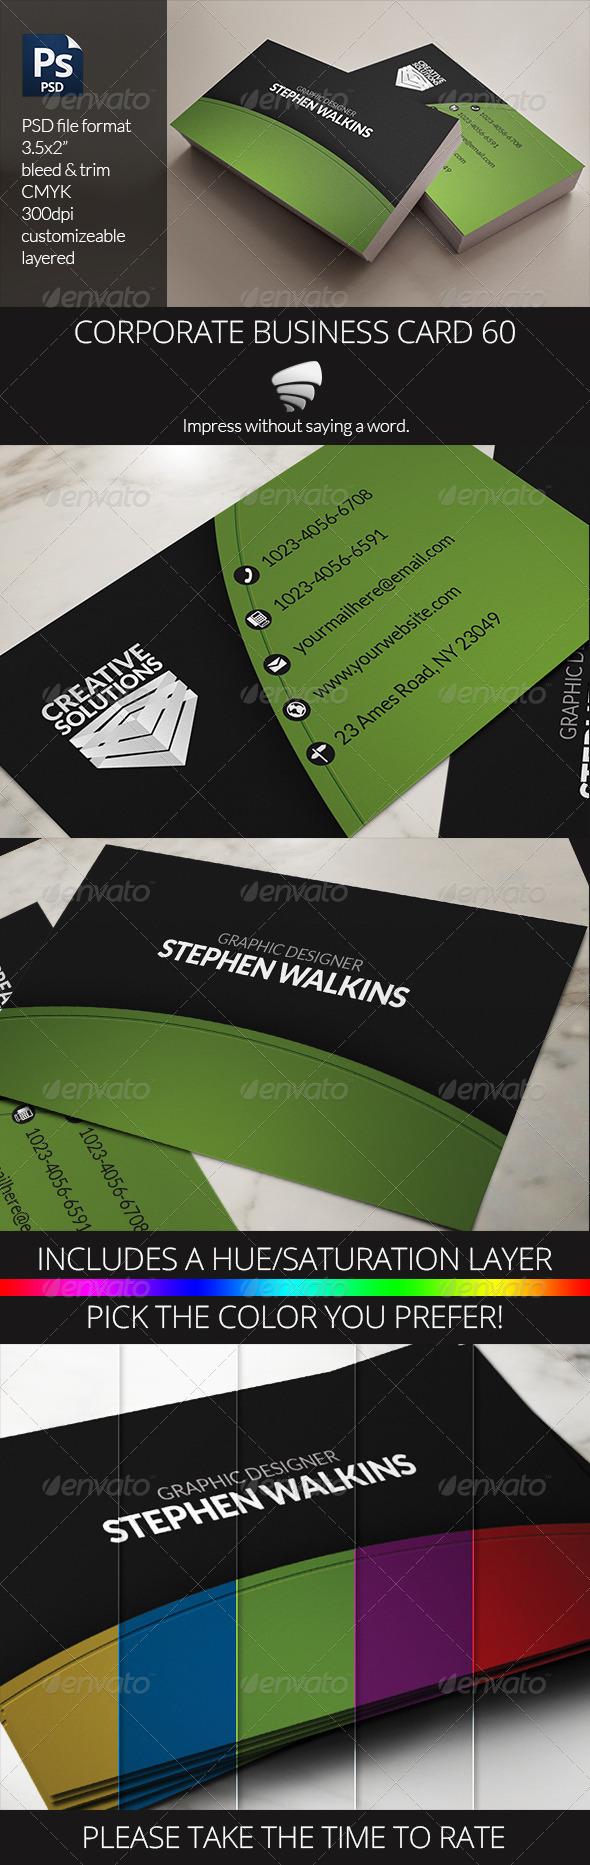 Corporate Business Card 60 - Corporate Business Cards